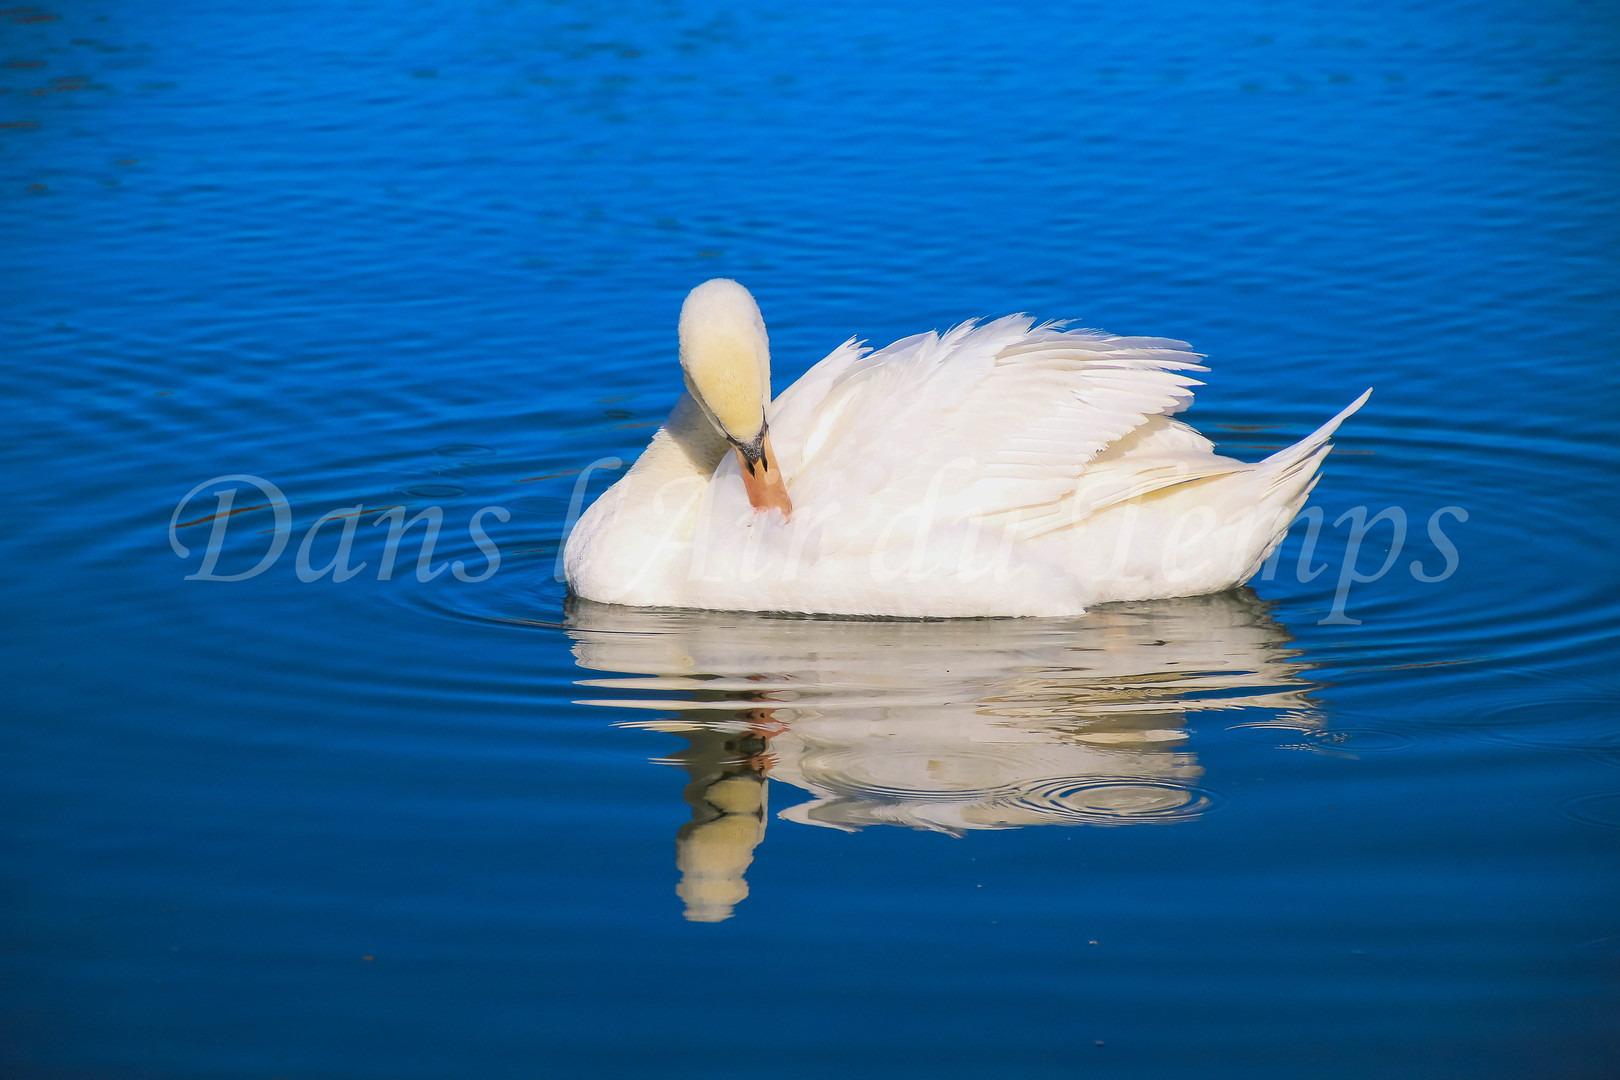 cygne en reflet sur eau bleue.jpg